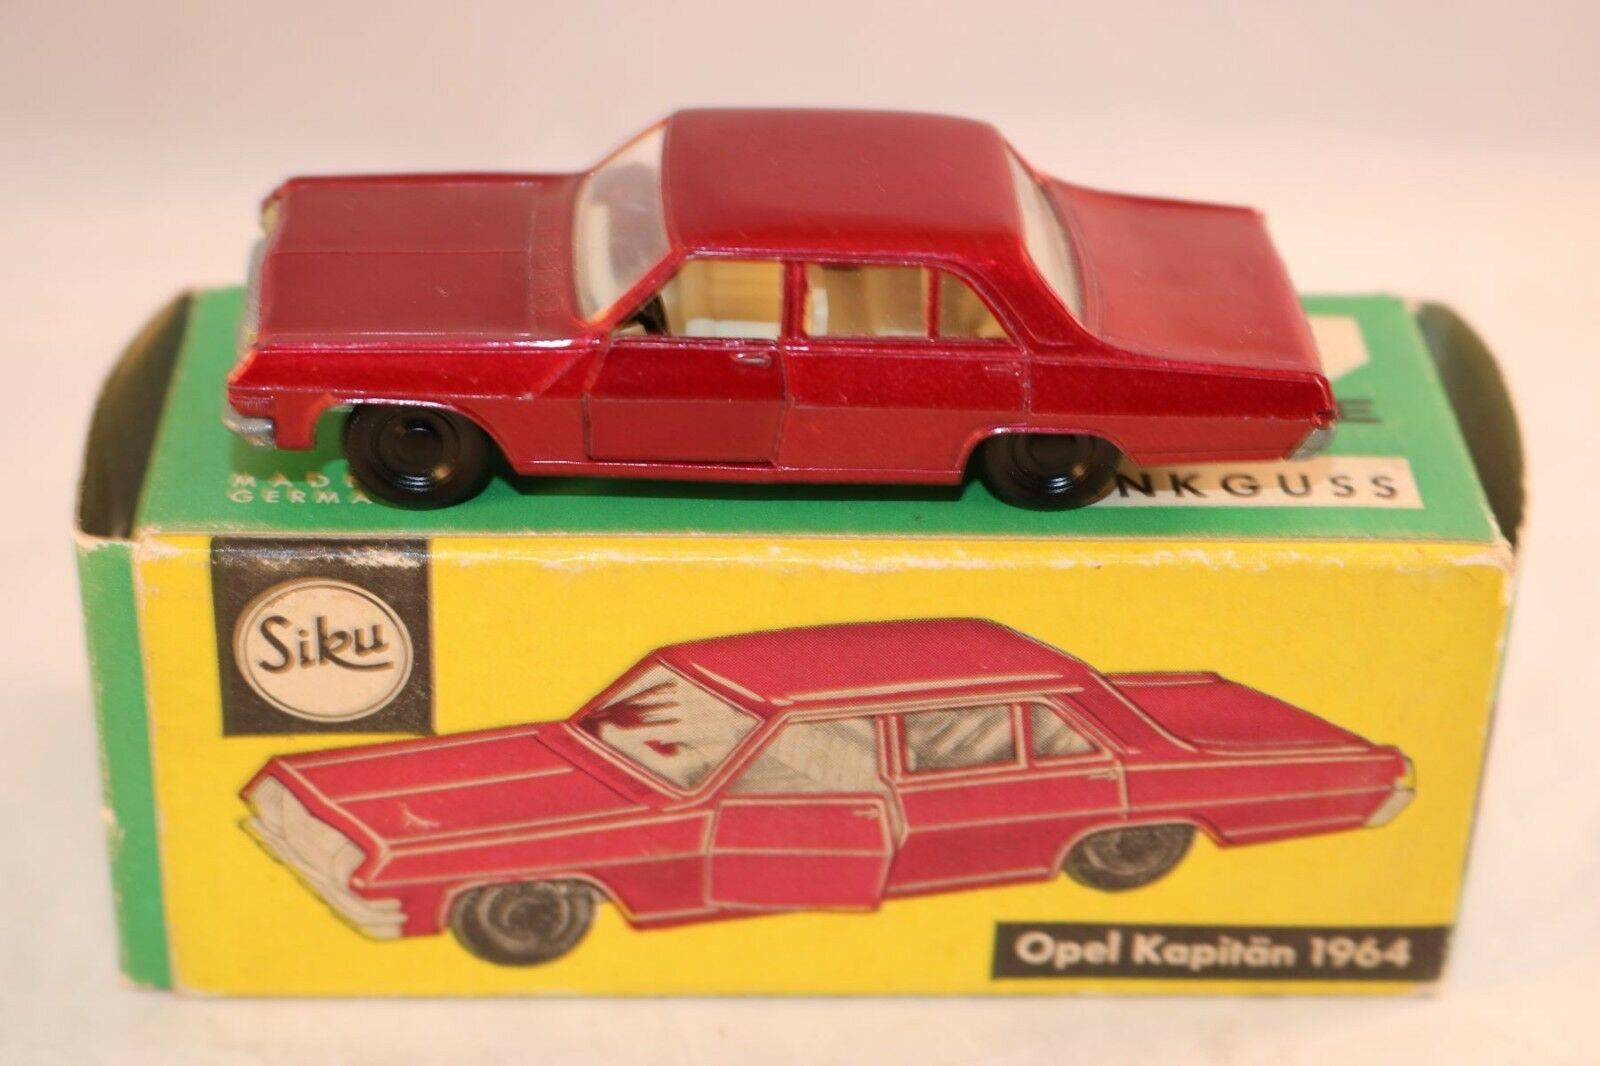 Siku V 252 Opel Kapitan 1964 in sehr gutem Zustand OVP very near mint in box